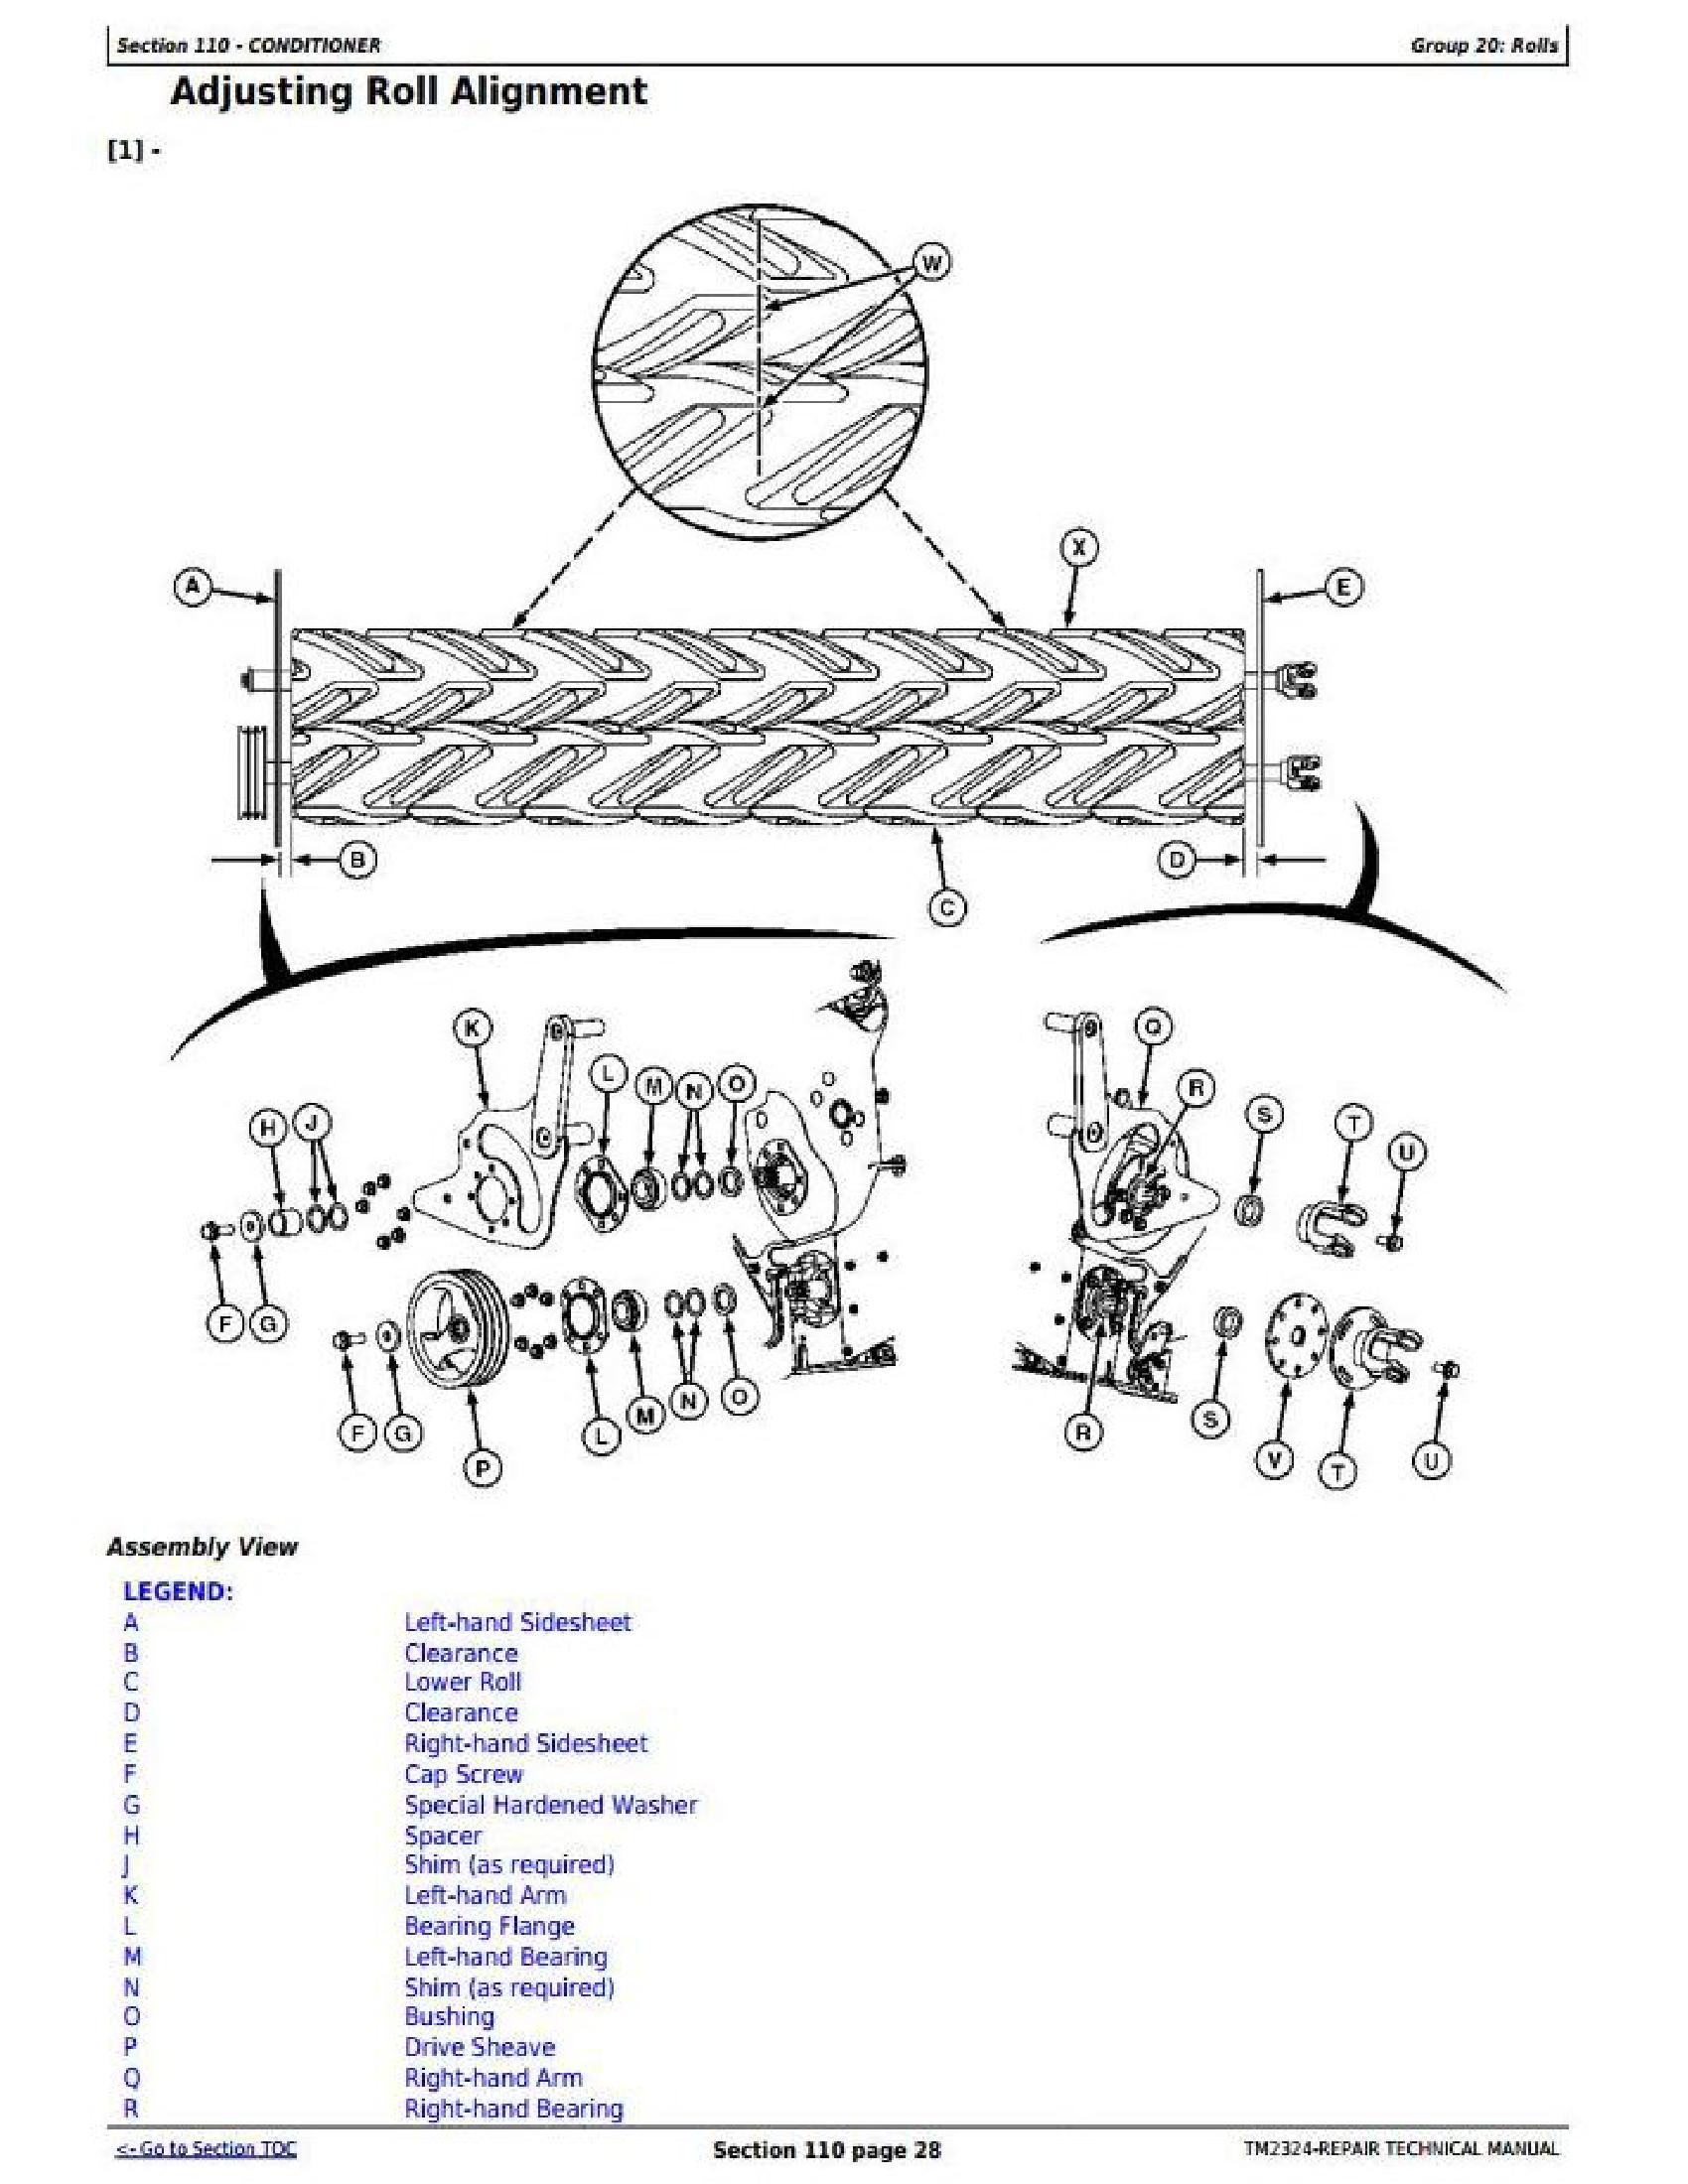 John Deere 1FF210GXC520001- manual pdf